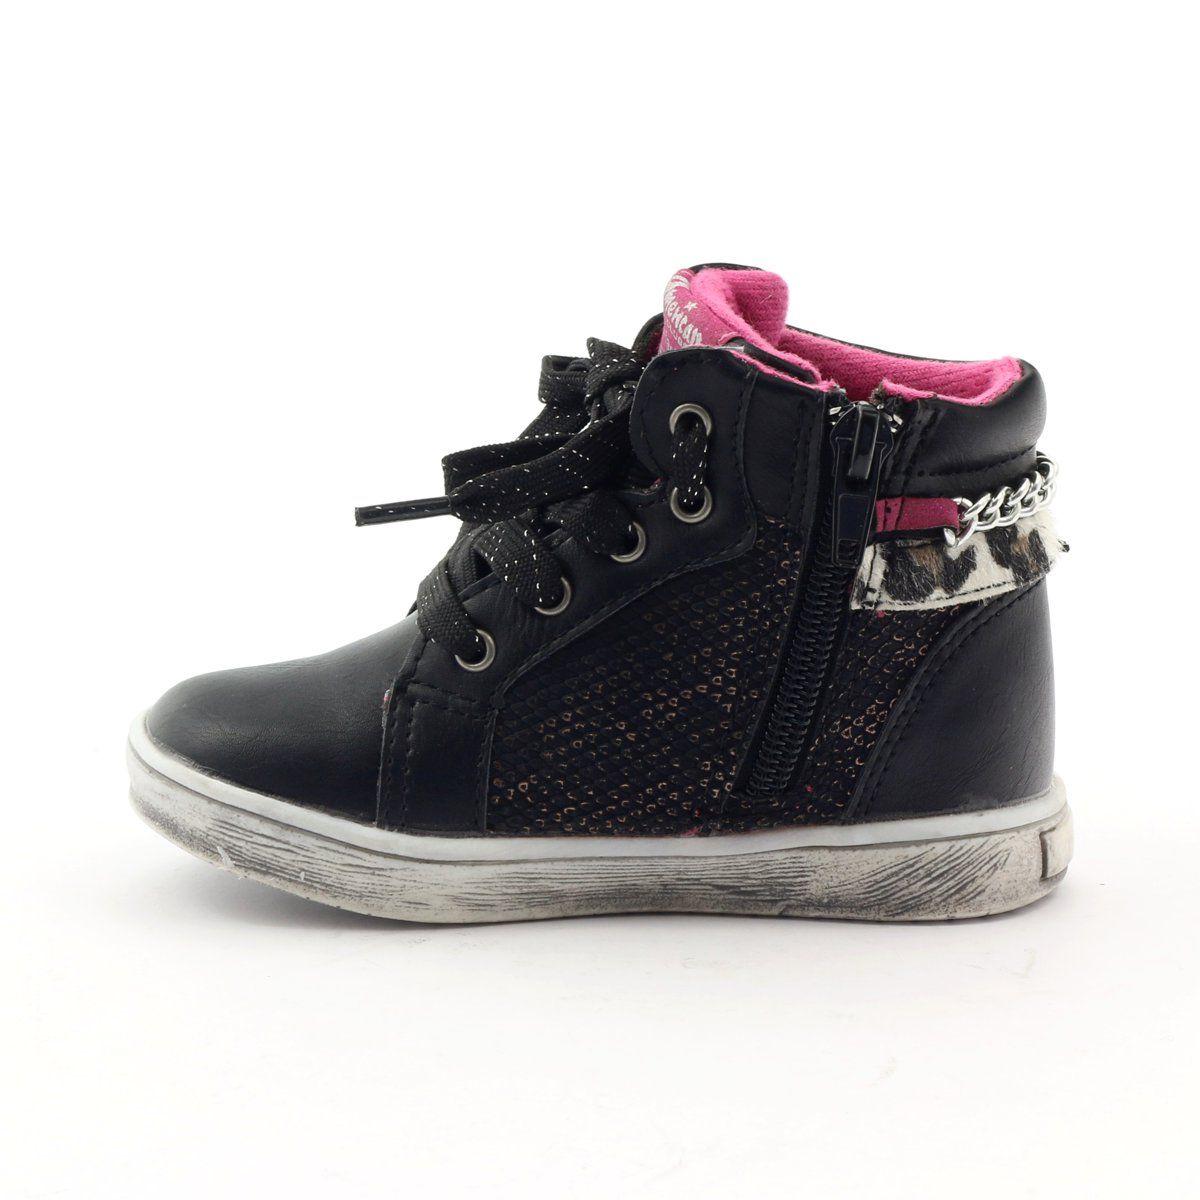 American Club Trzewiki Sportowe Kwiatek American 10108 Rozowe Zolte Czarne Childrens Shoes Kid Shoes Club Shoes